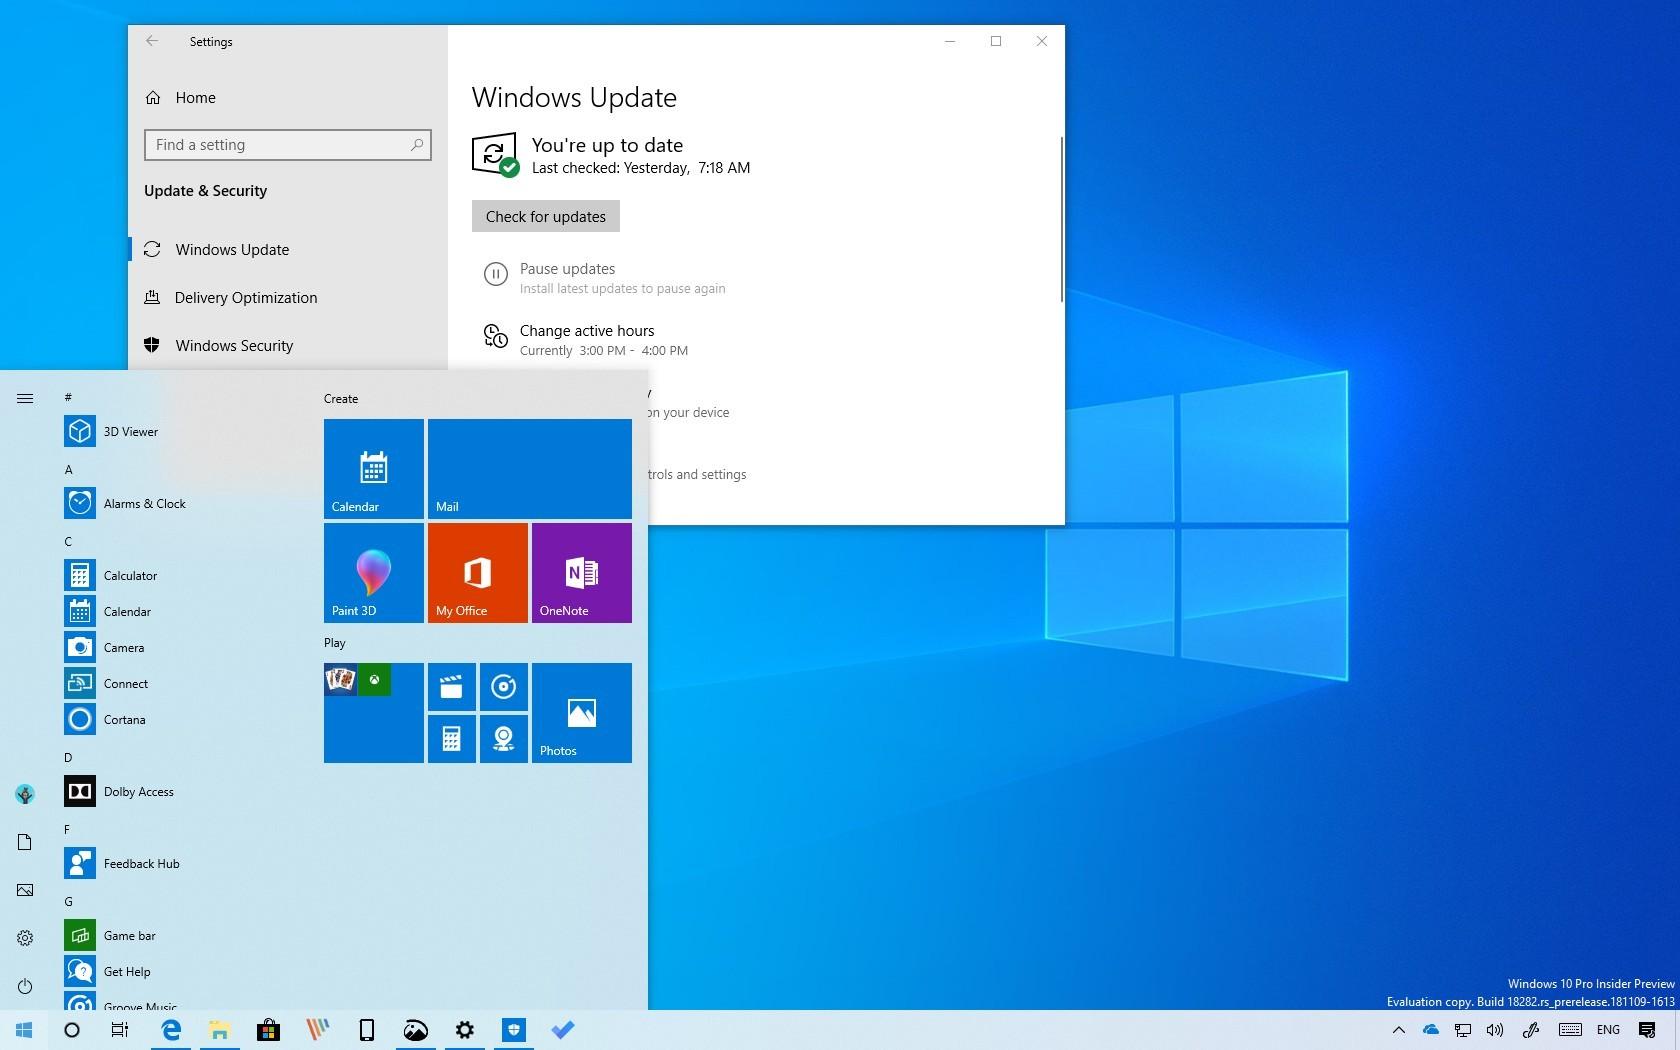 windows 10 update 2019 problems